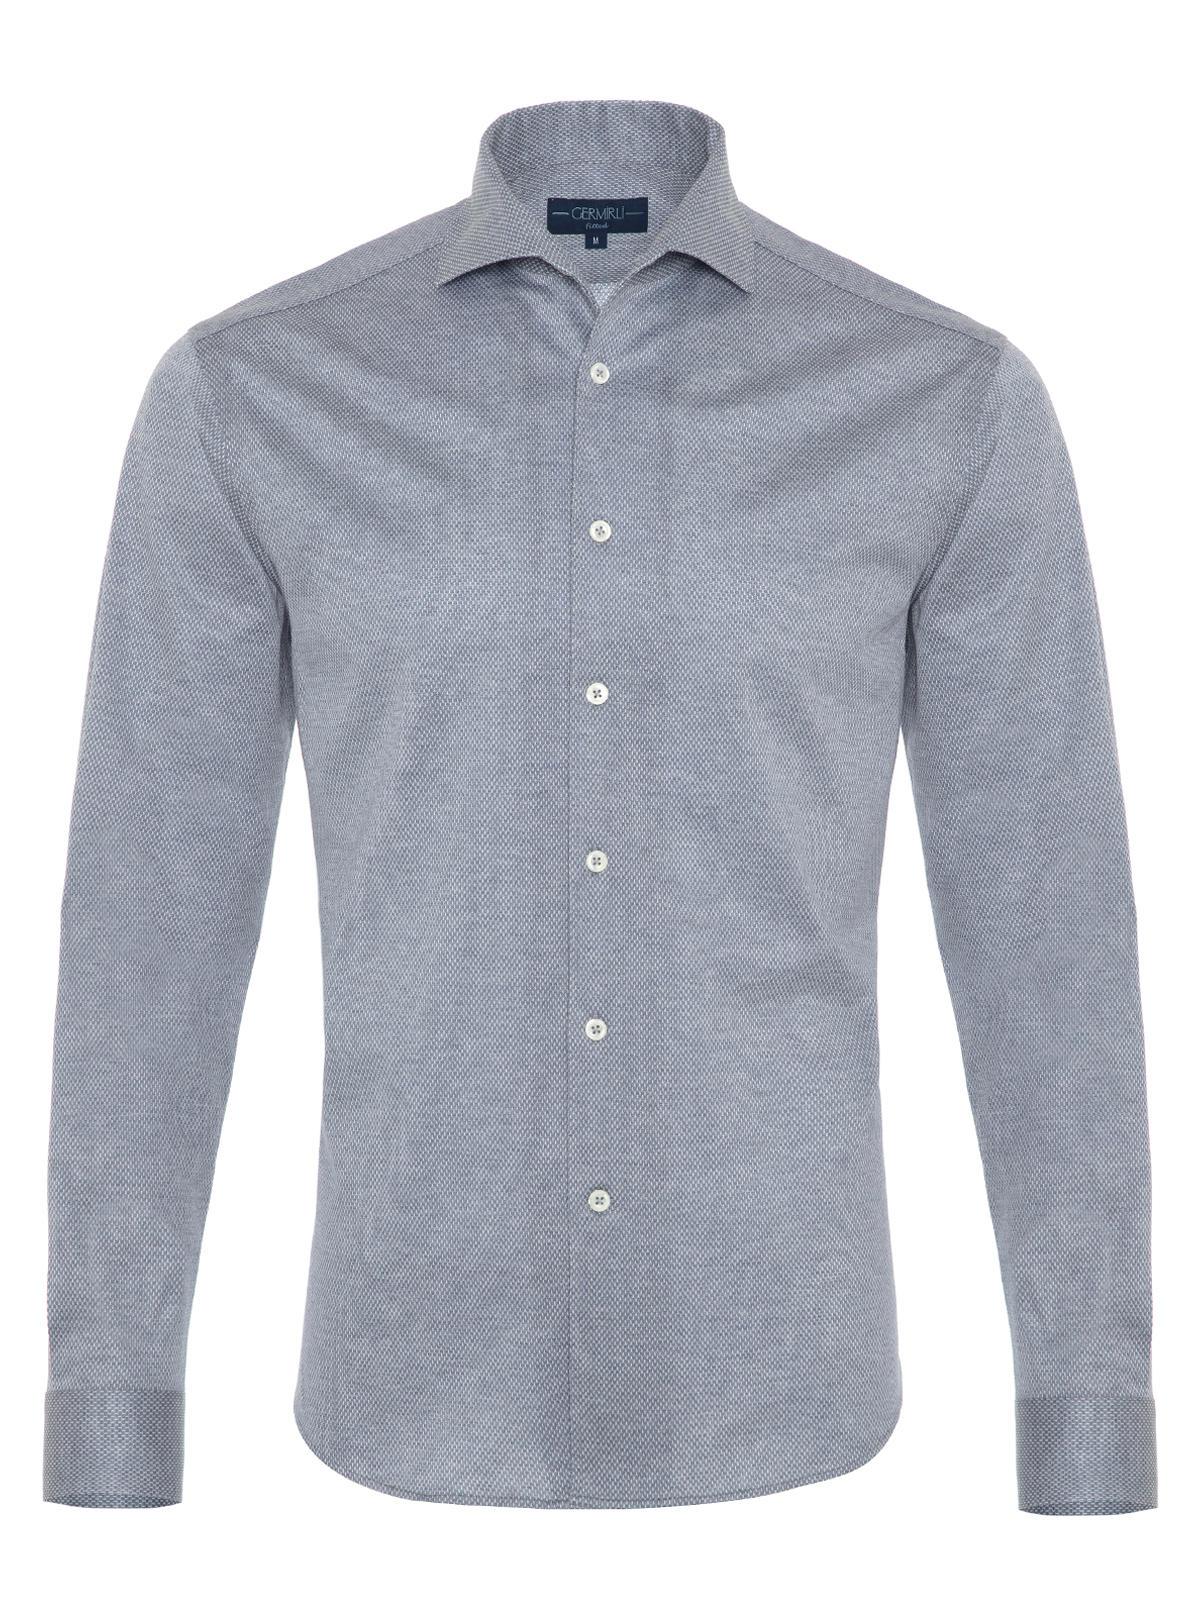 Germirli Nevapaş Spread Collar Grey Tailor Fit Shirt